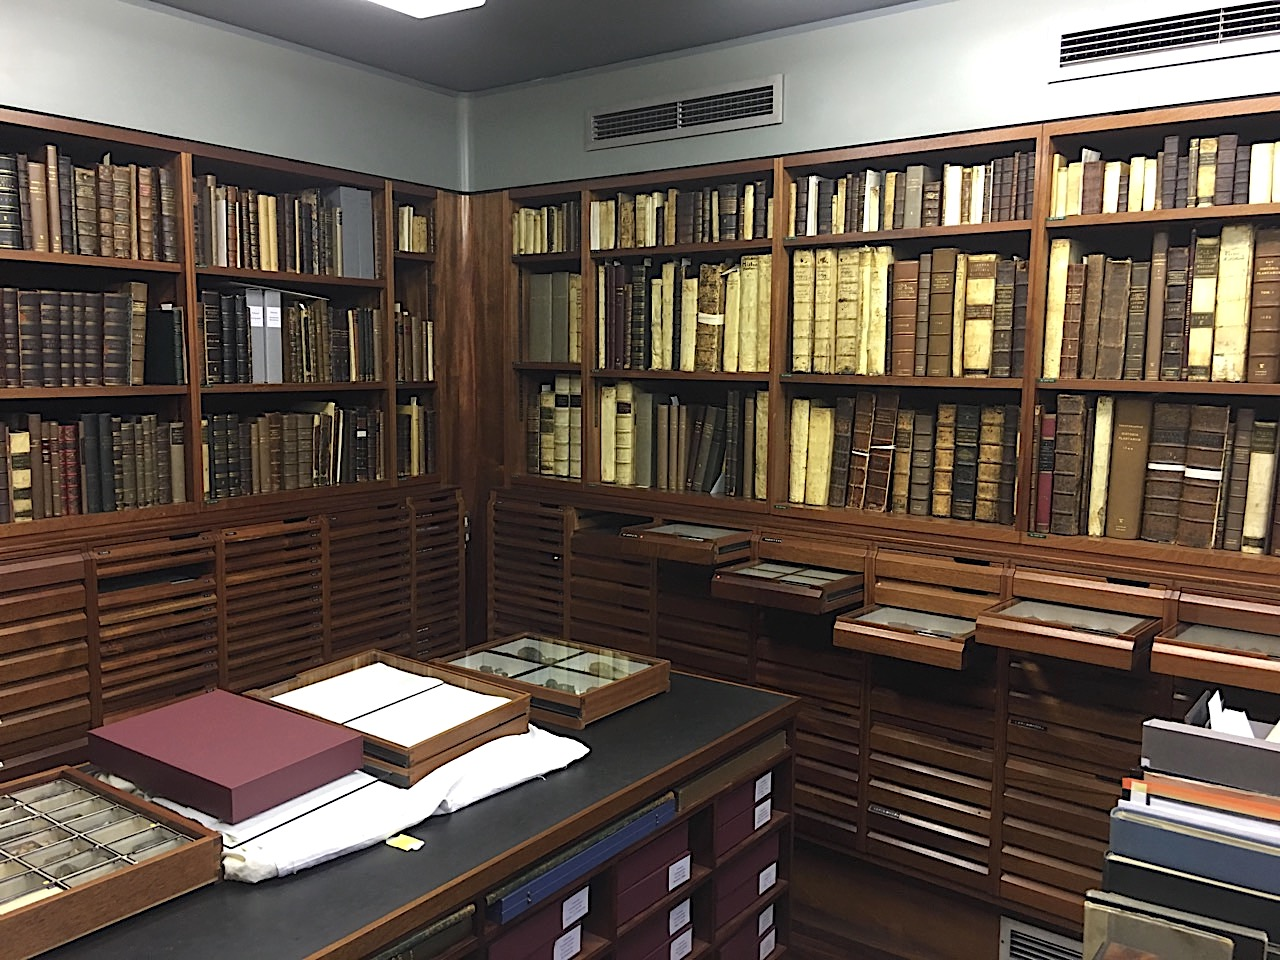 Linnaeus Collection, Linnean Society (© KS / Rolling Harbour)